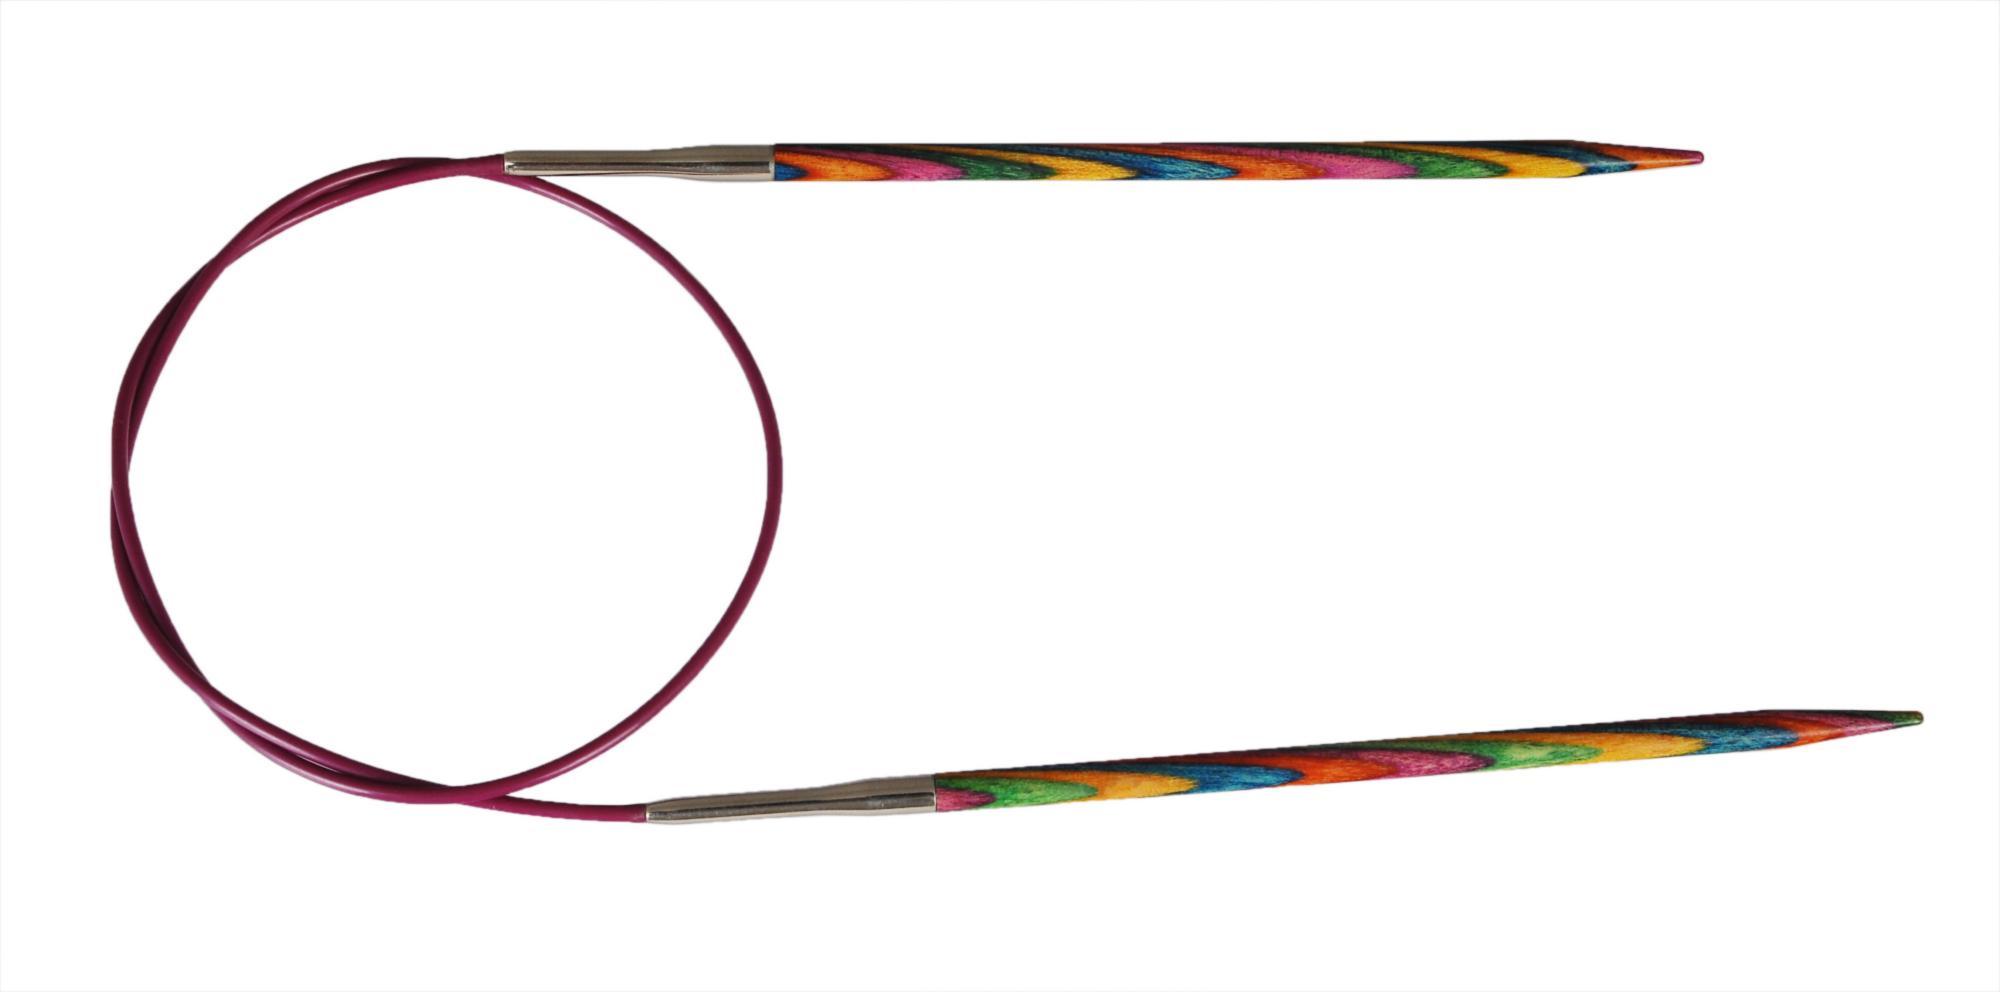 Спицы круговые 120 см Symfonie Wood KnitPro, 21373, 7.00 мм